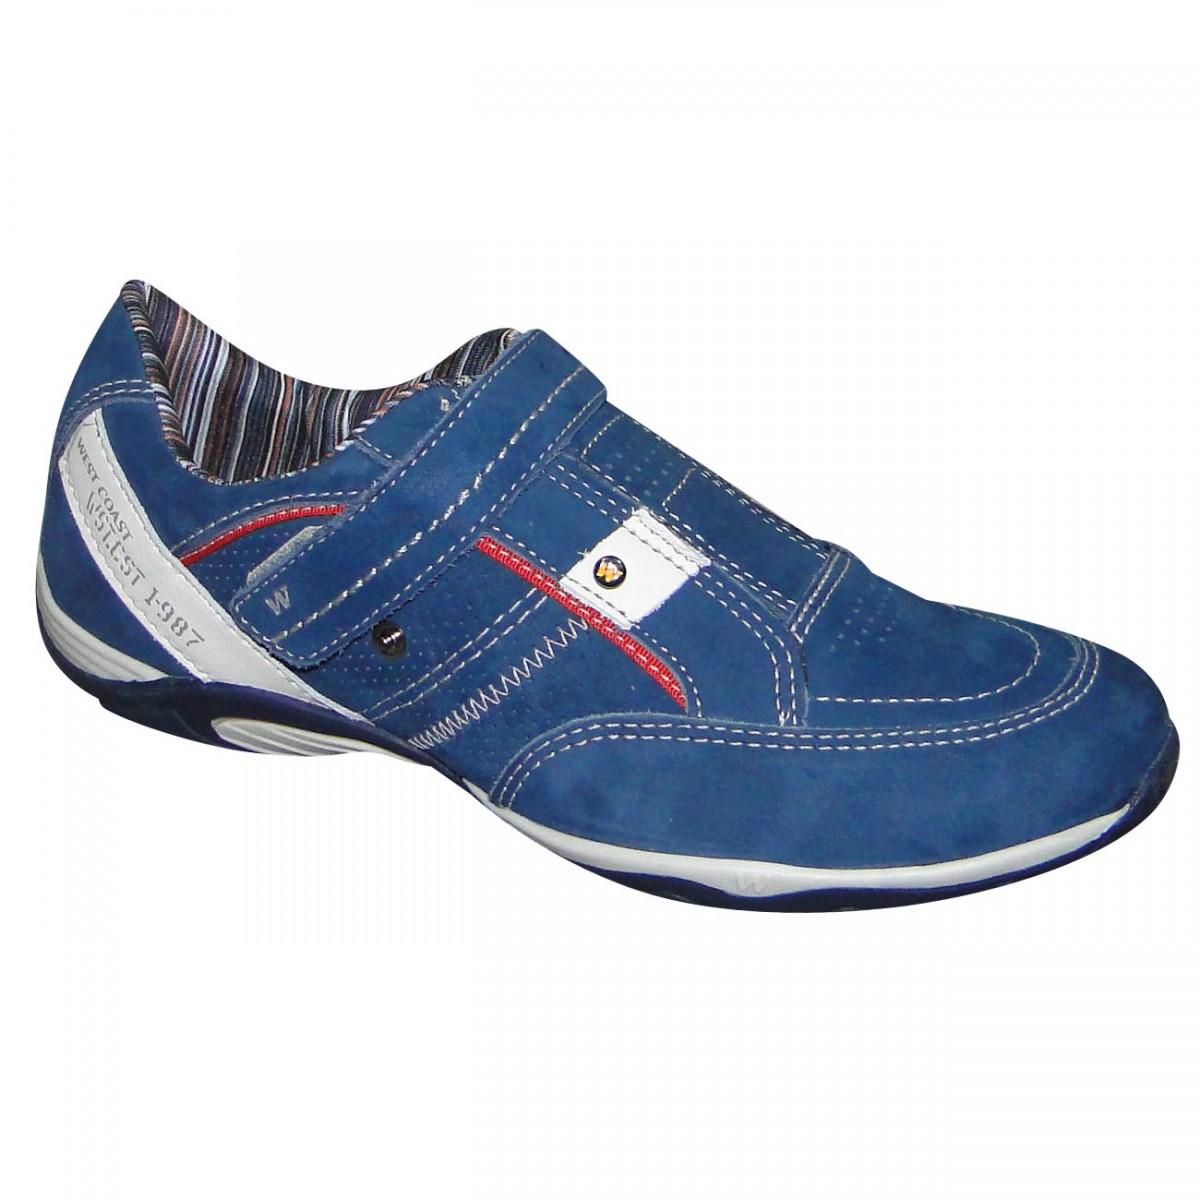 e11975c328b03 Sapatenis West Coast 119702 119702-2 - Royal - Chuteira Nike, Adidas ...